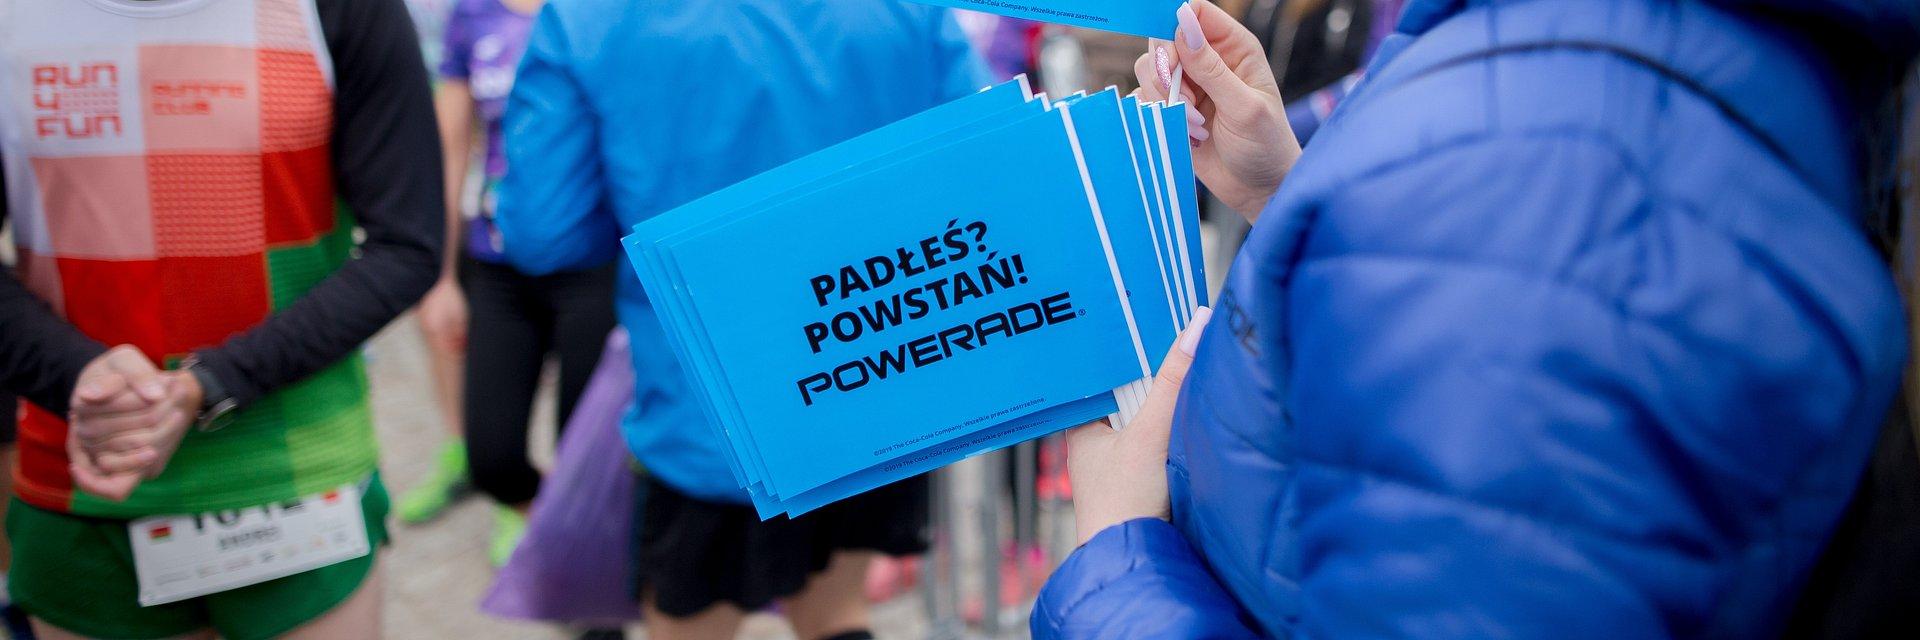 Global Shopper Marketing eventowo z Powerade